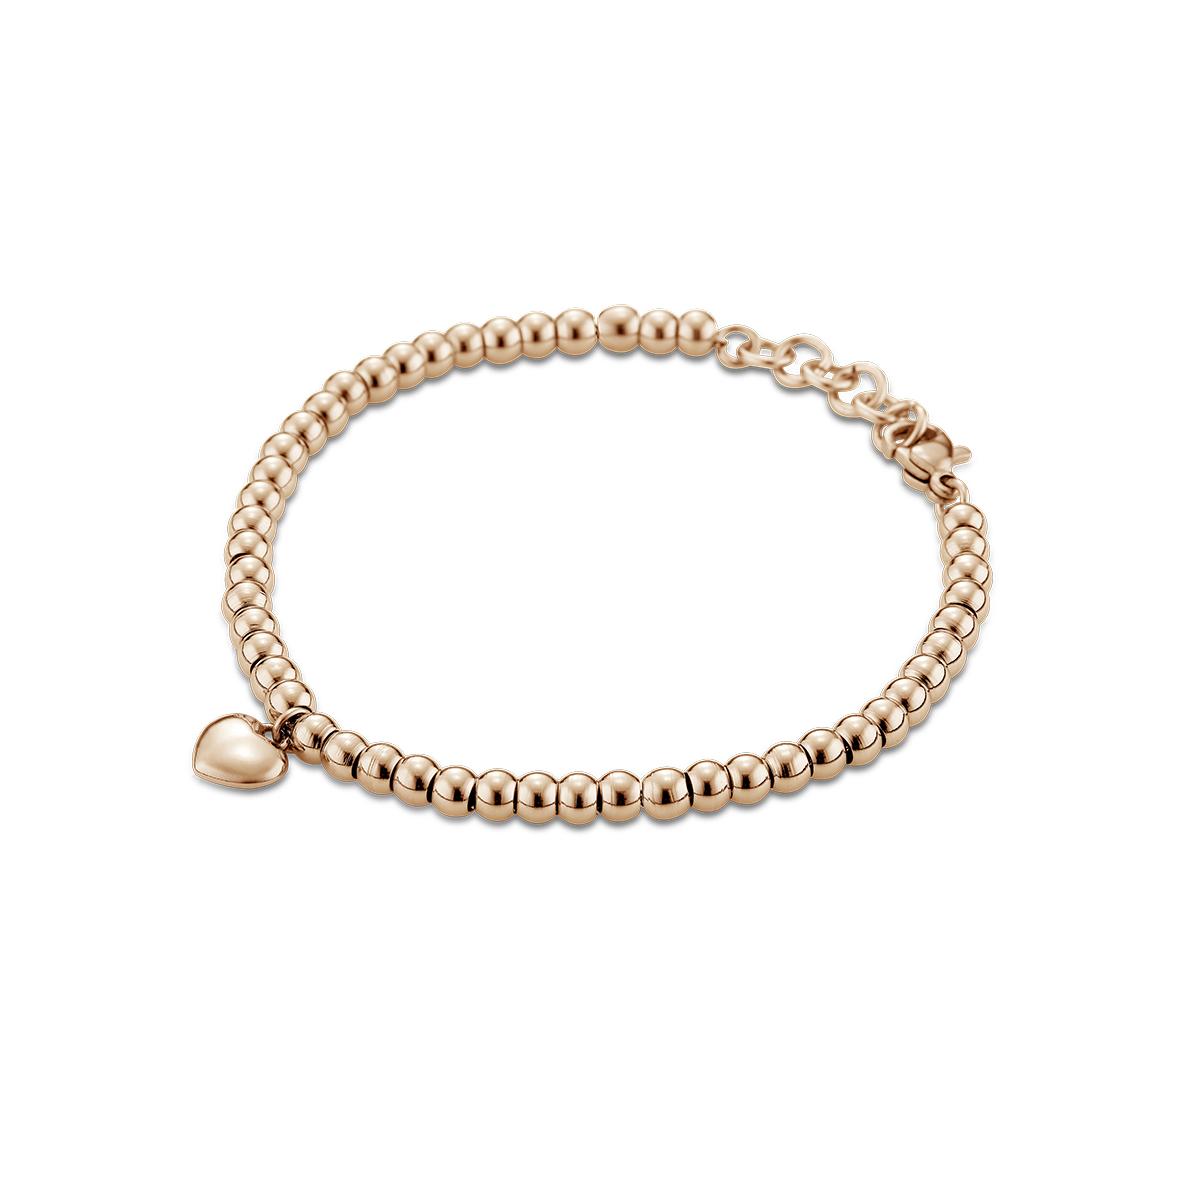 CX204 點滴意象-甜美愛心串珠手鍊